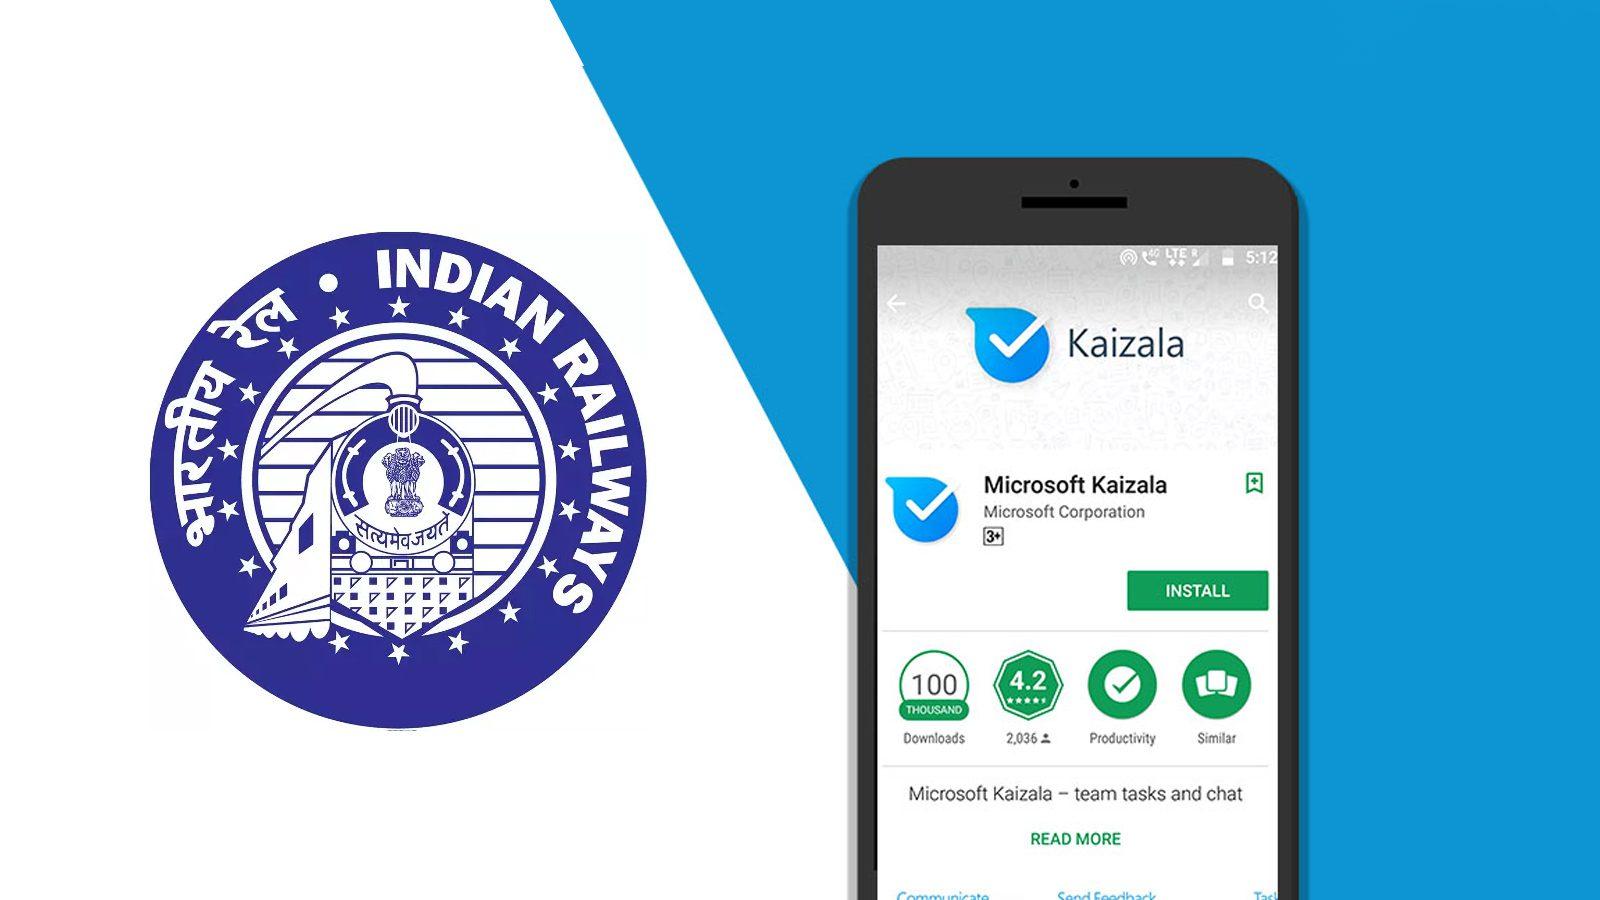 Indian Railways Pair with Microsoft Kaizala